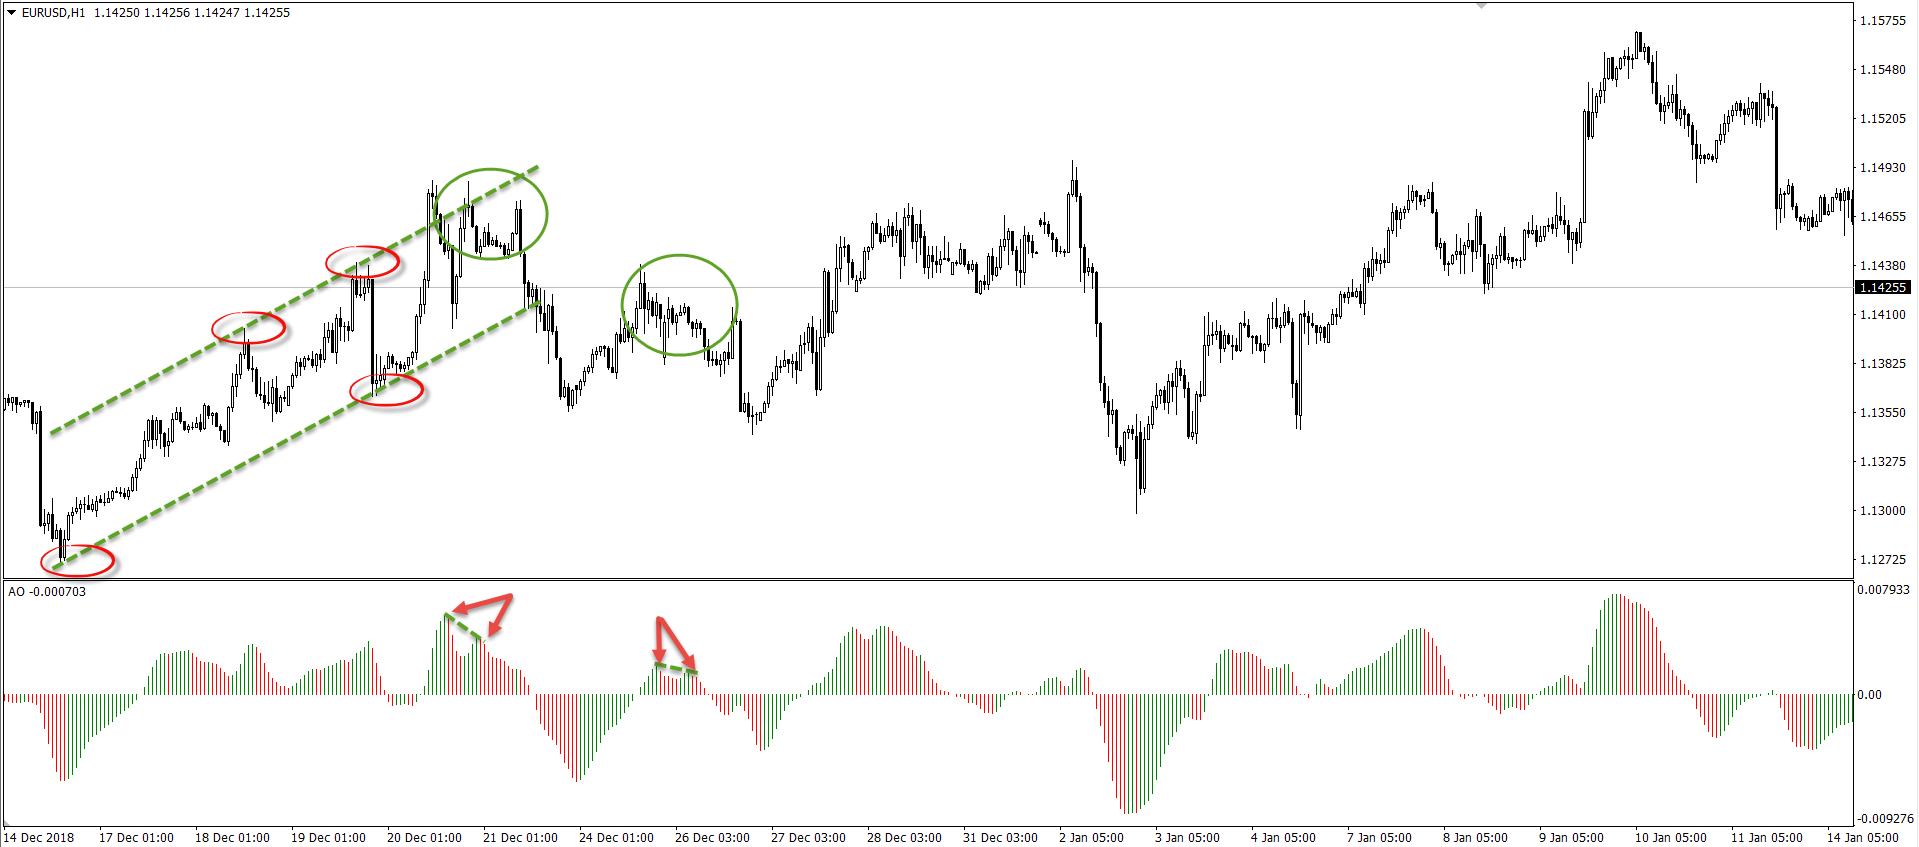 Measure Market Momentum Using the Awesome Oscillator 5